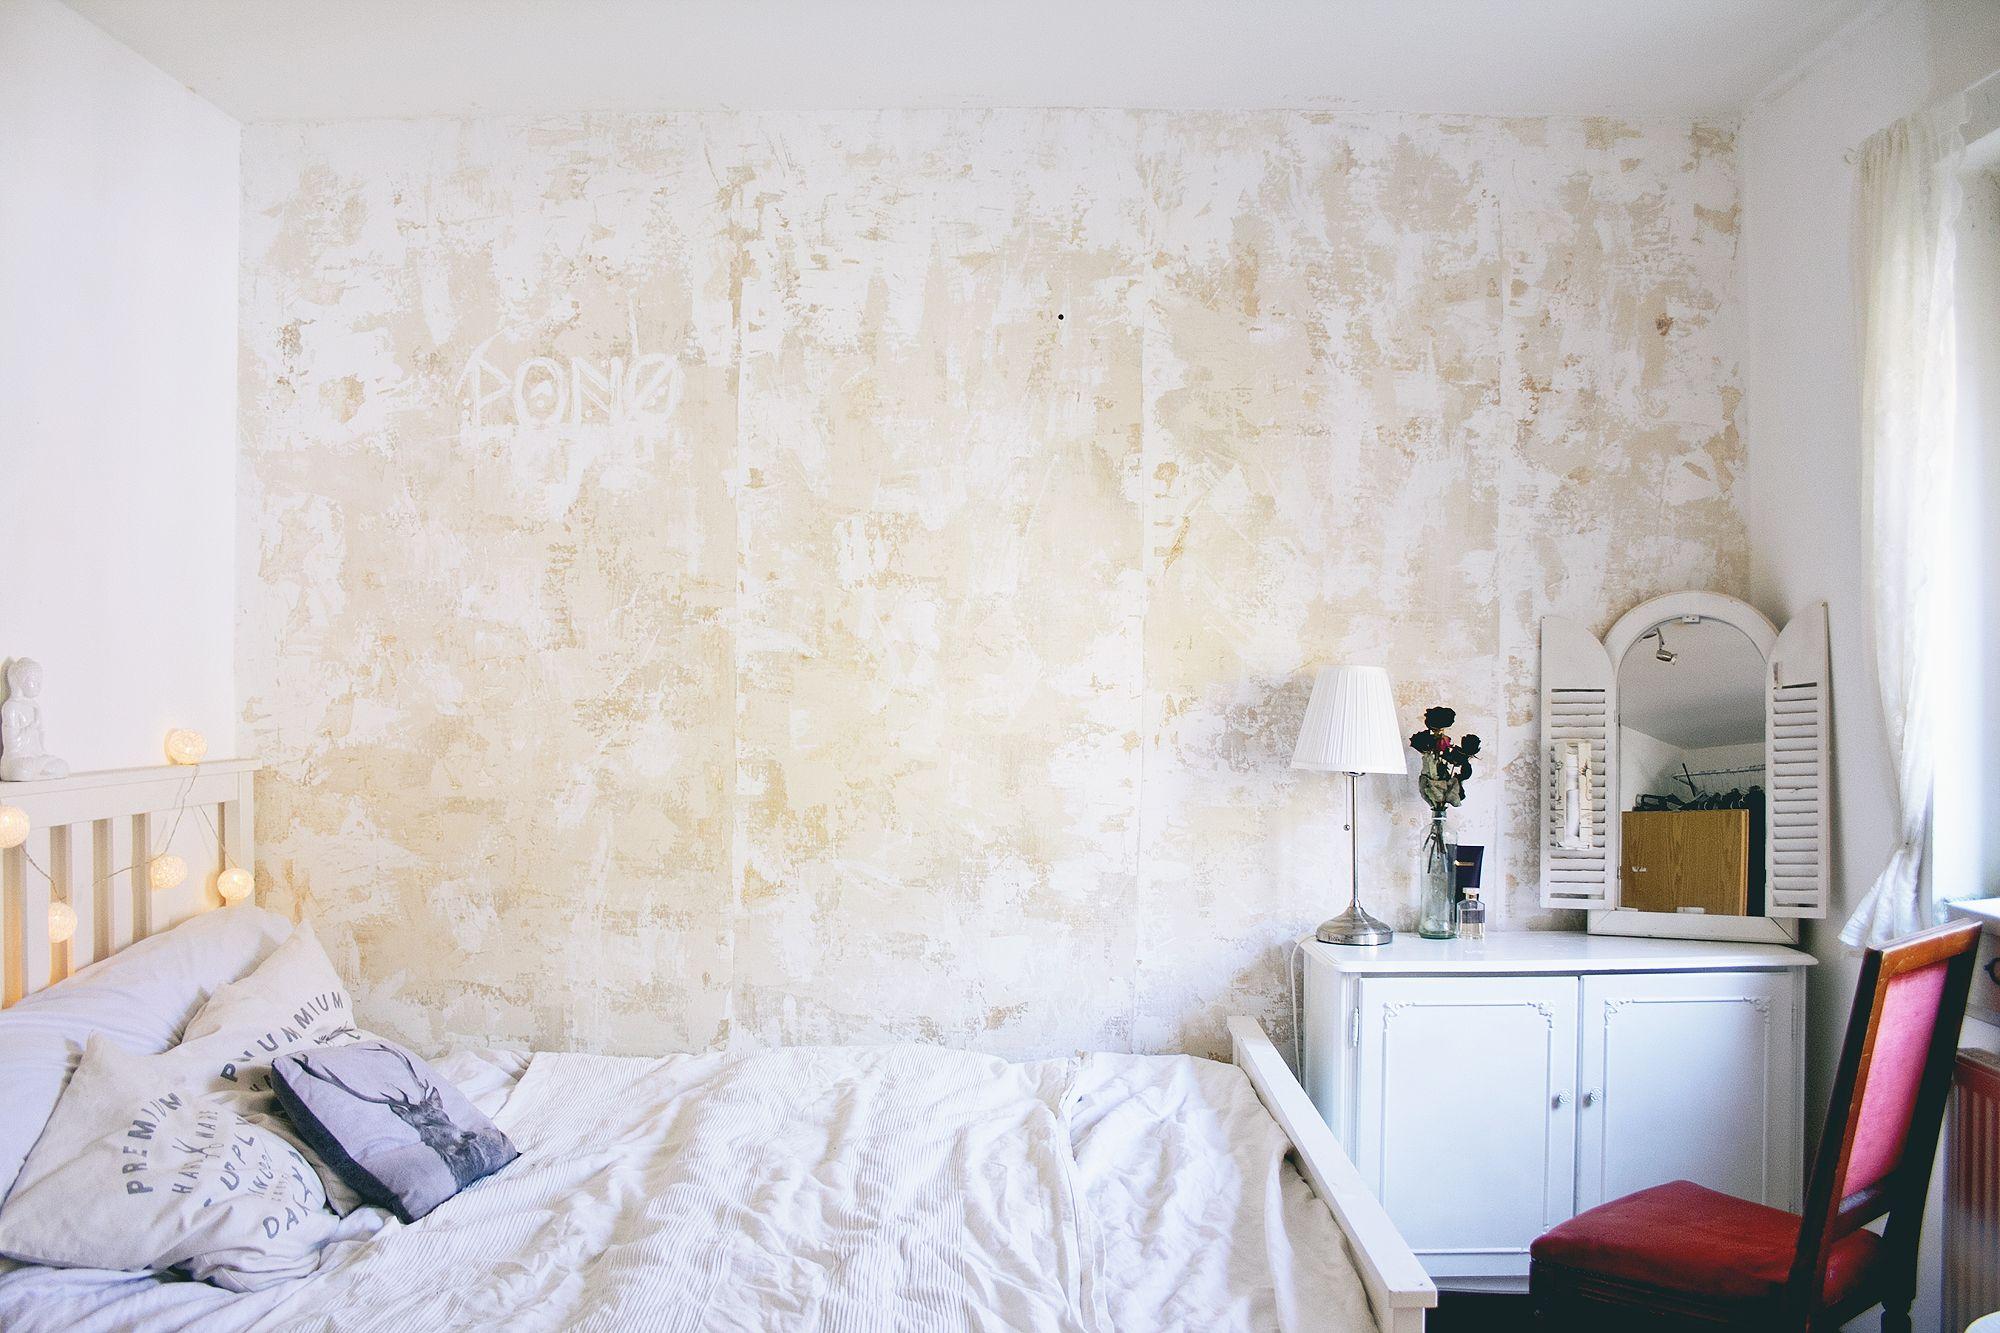 Diy Eine Wand Patinieren Wand Im Used Look Esszimmer Gestalten Wandgestaltung Wandgestaltung Wohnzimmer Grau